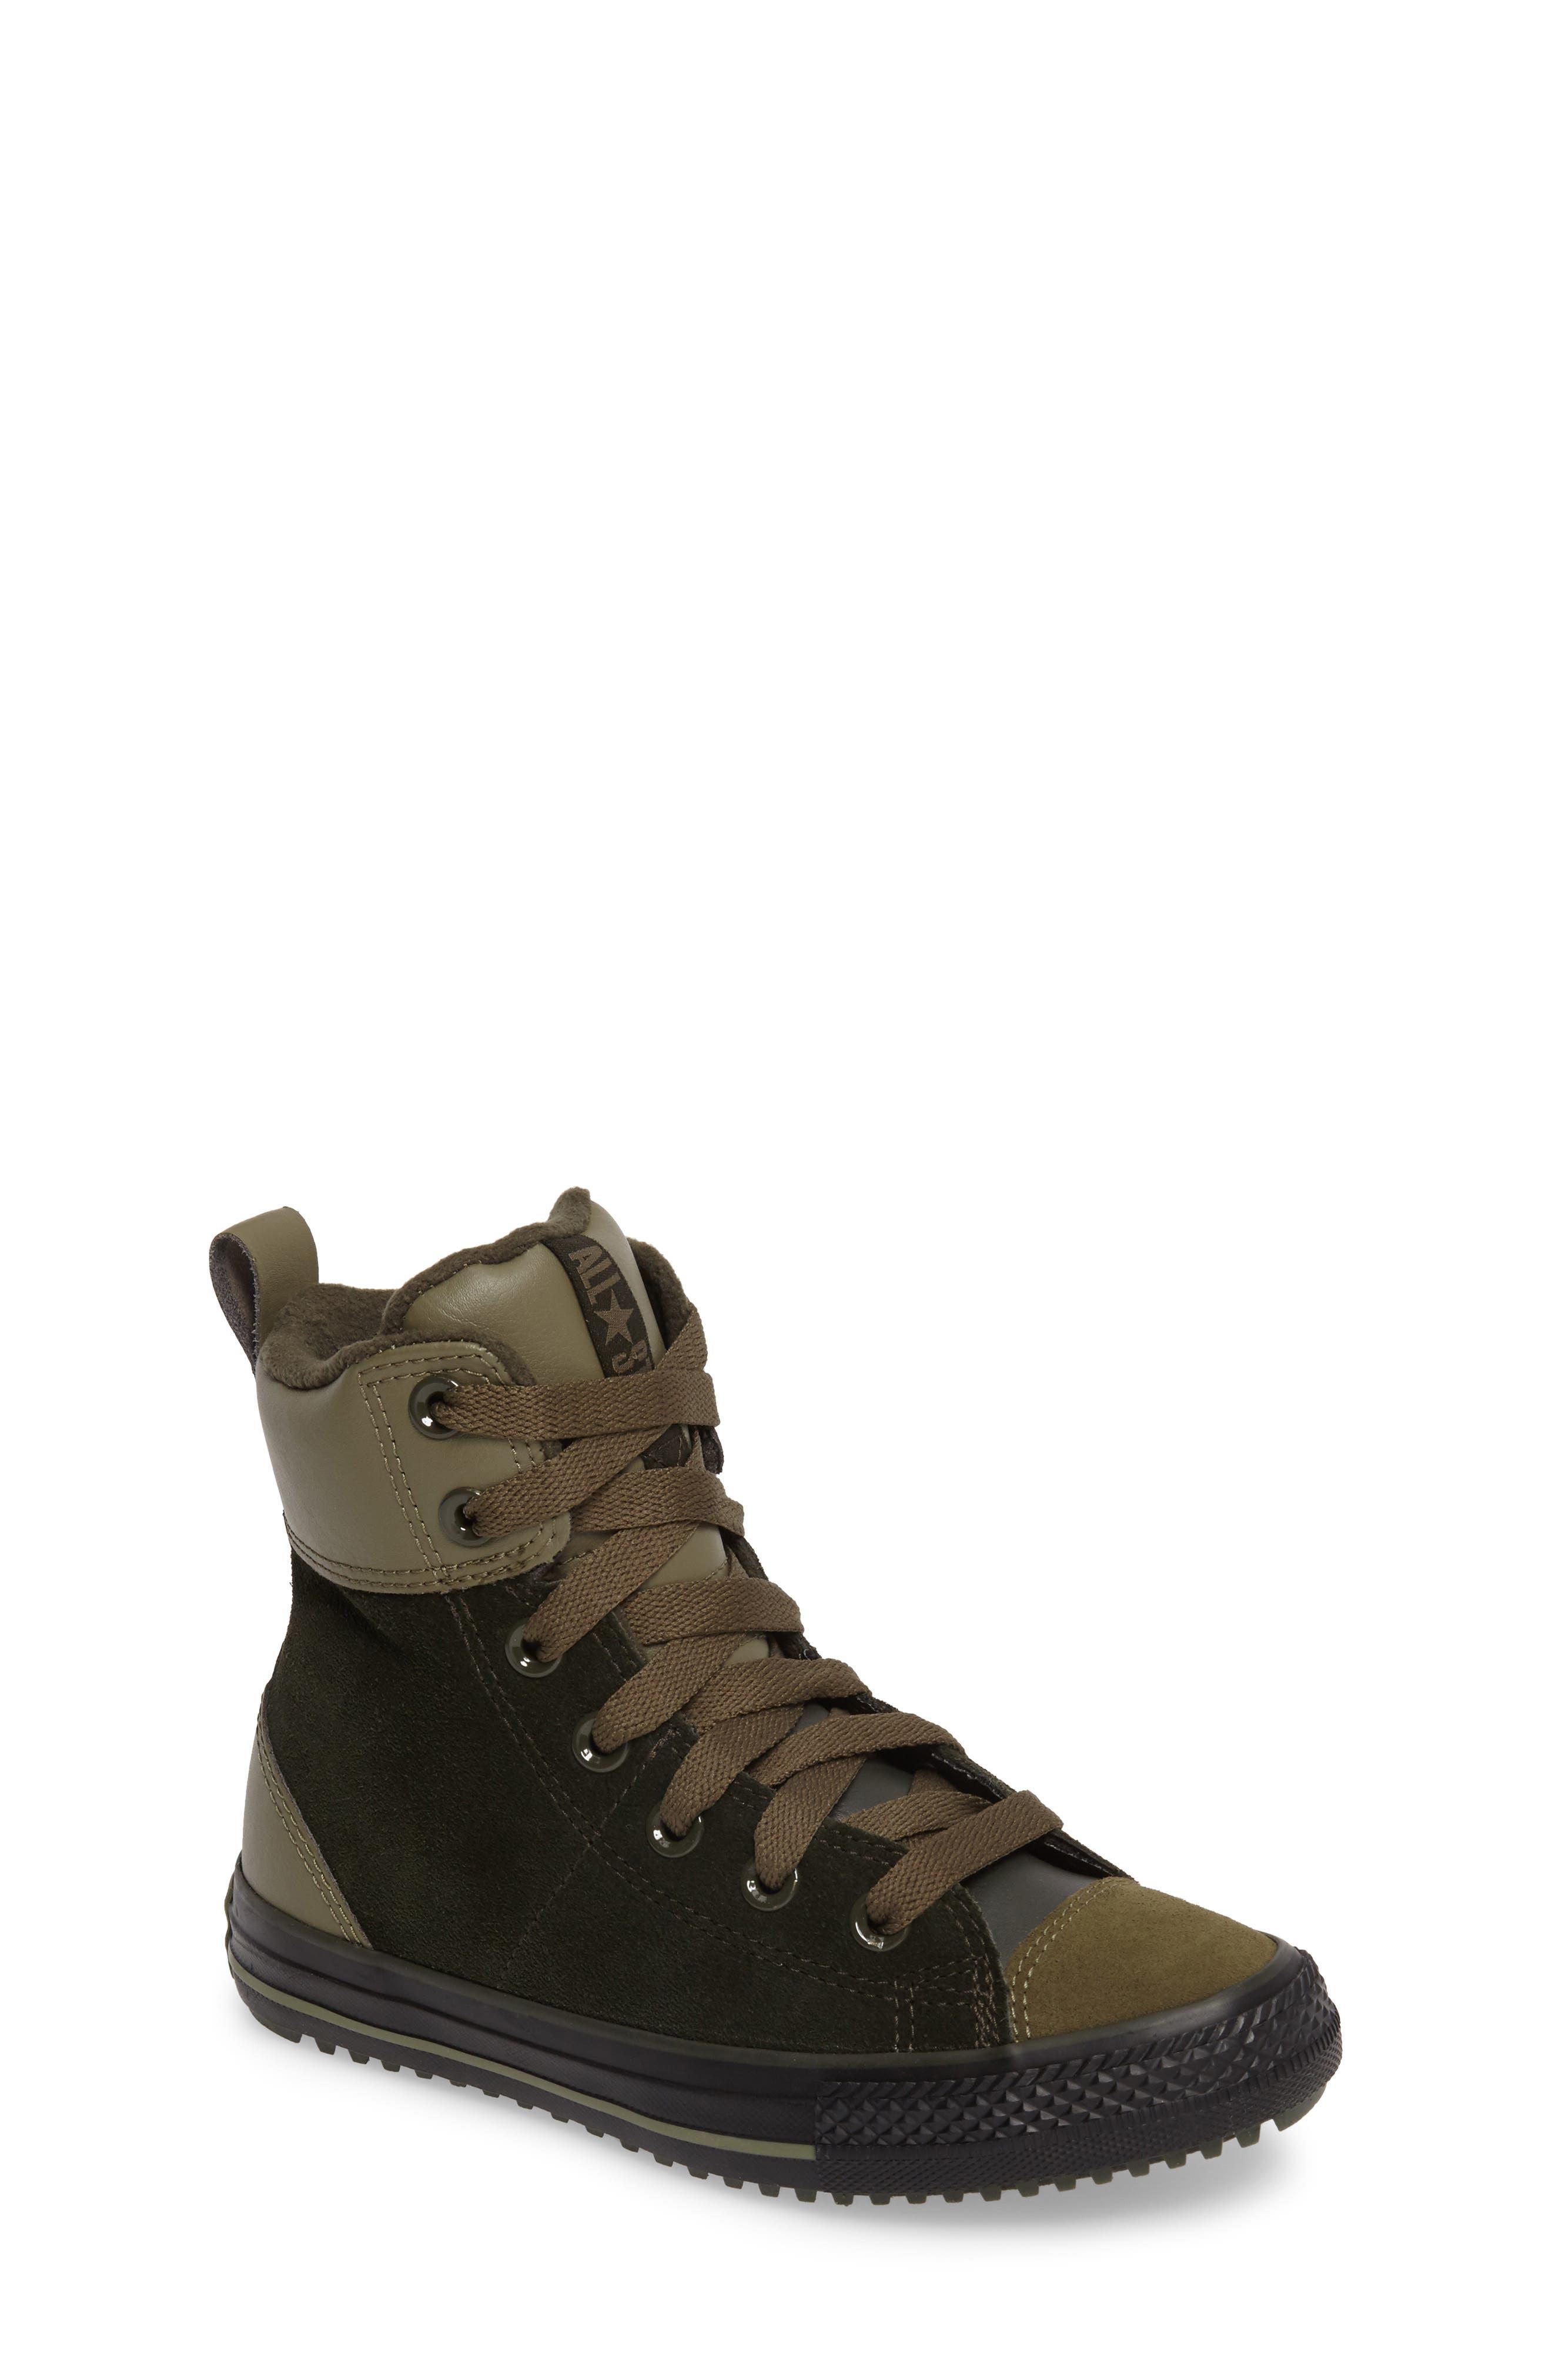 Chuck Taylor<sup>®</sup> All Star<sup>®</sup> Asphalt Sneaker Boot,                             Main thumbnail 2, color,